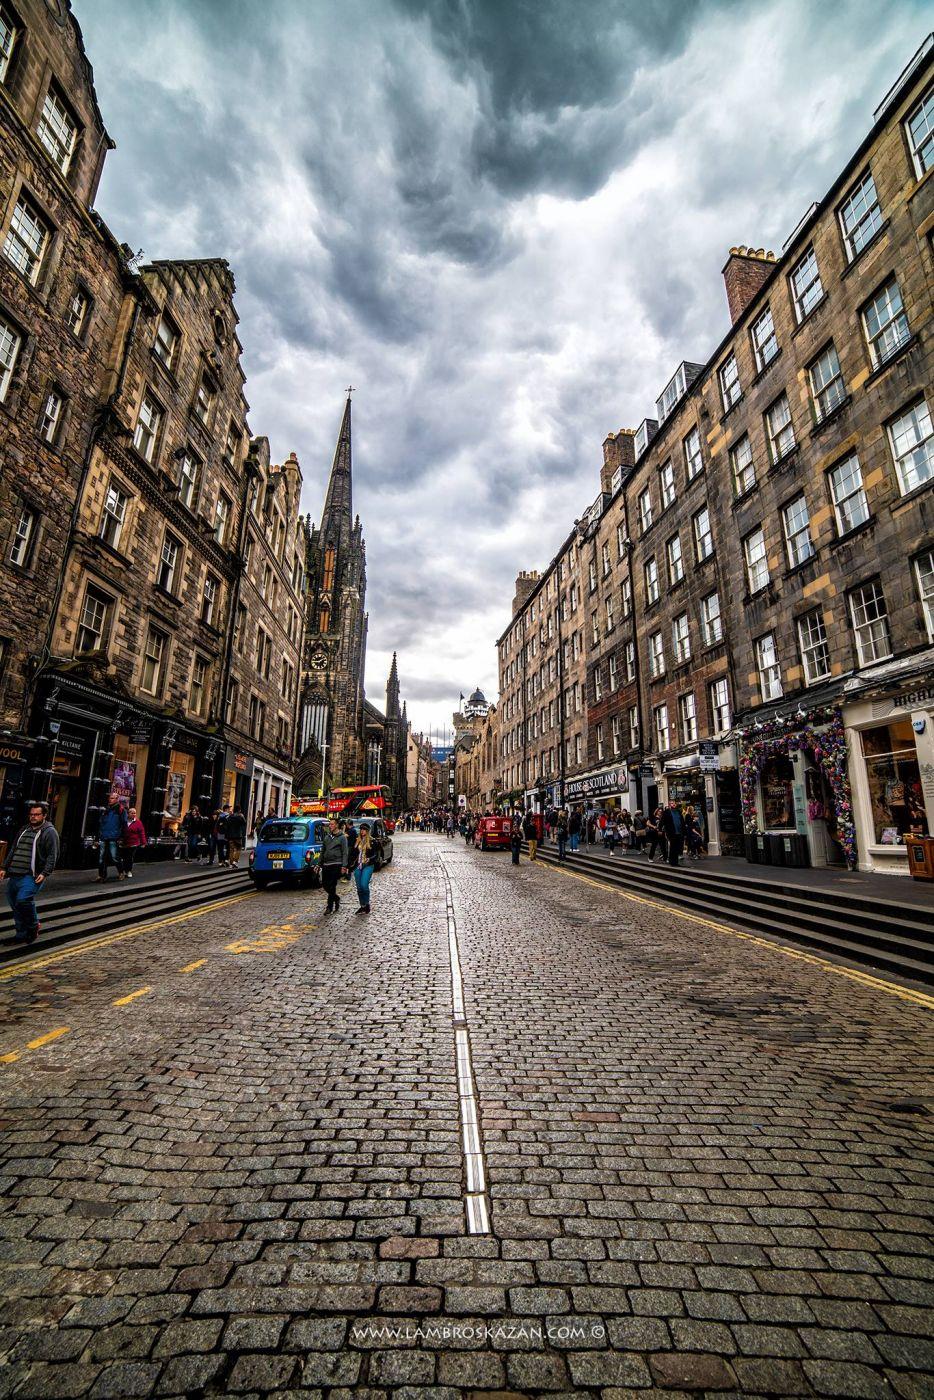 Old city of Edinburgh, United Kingdom